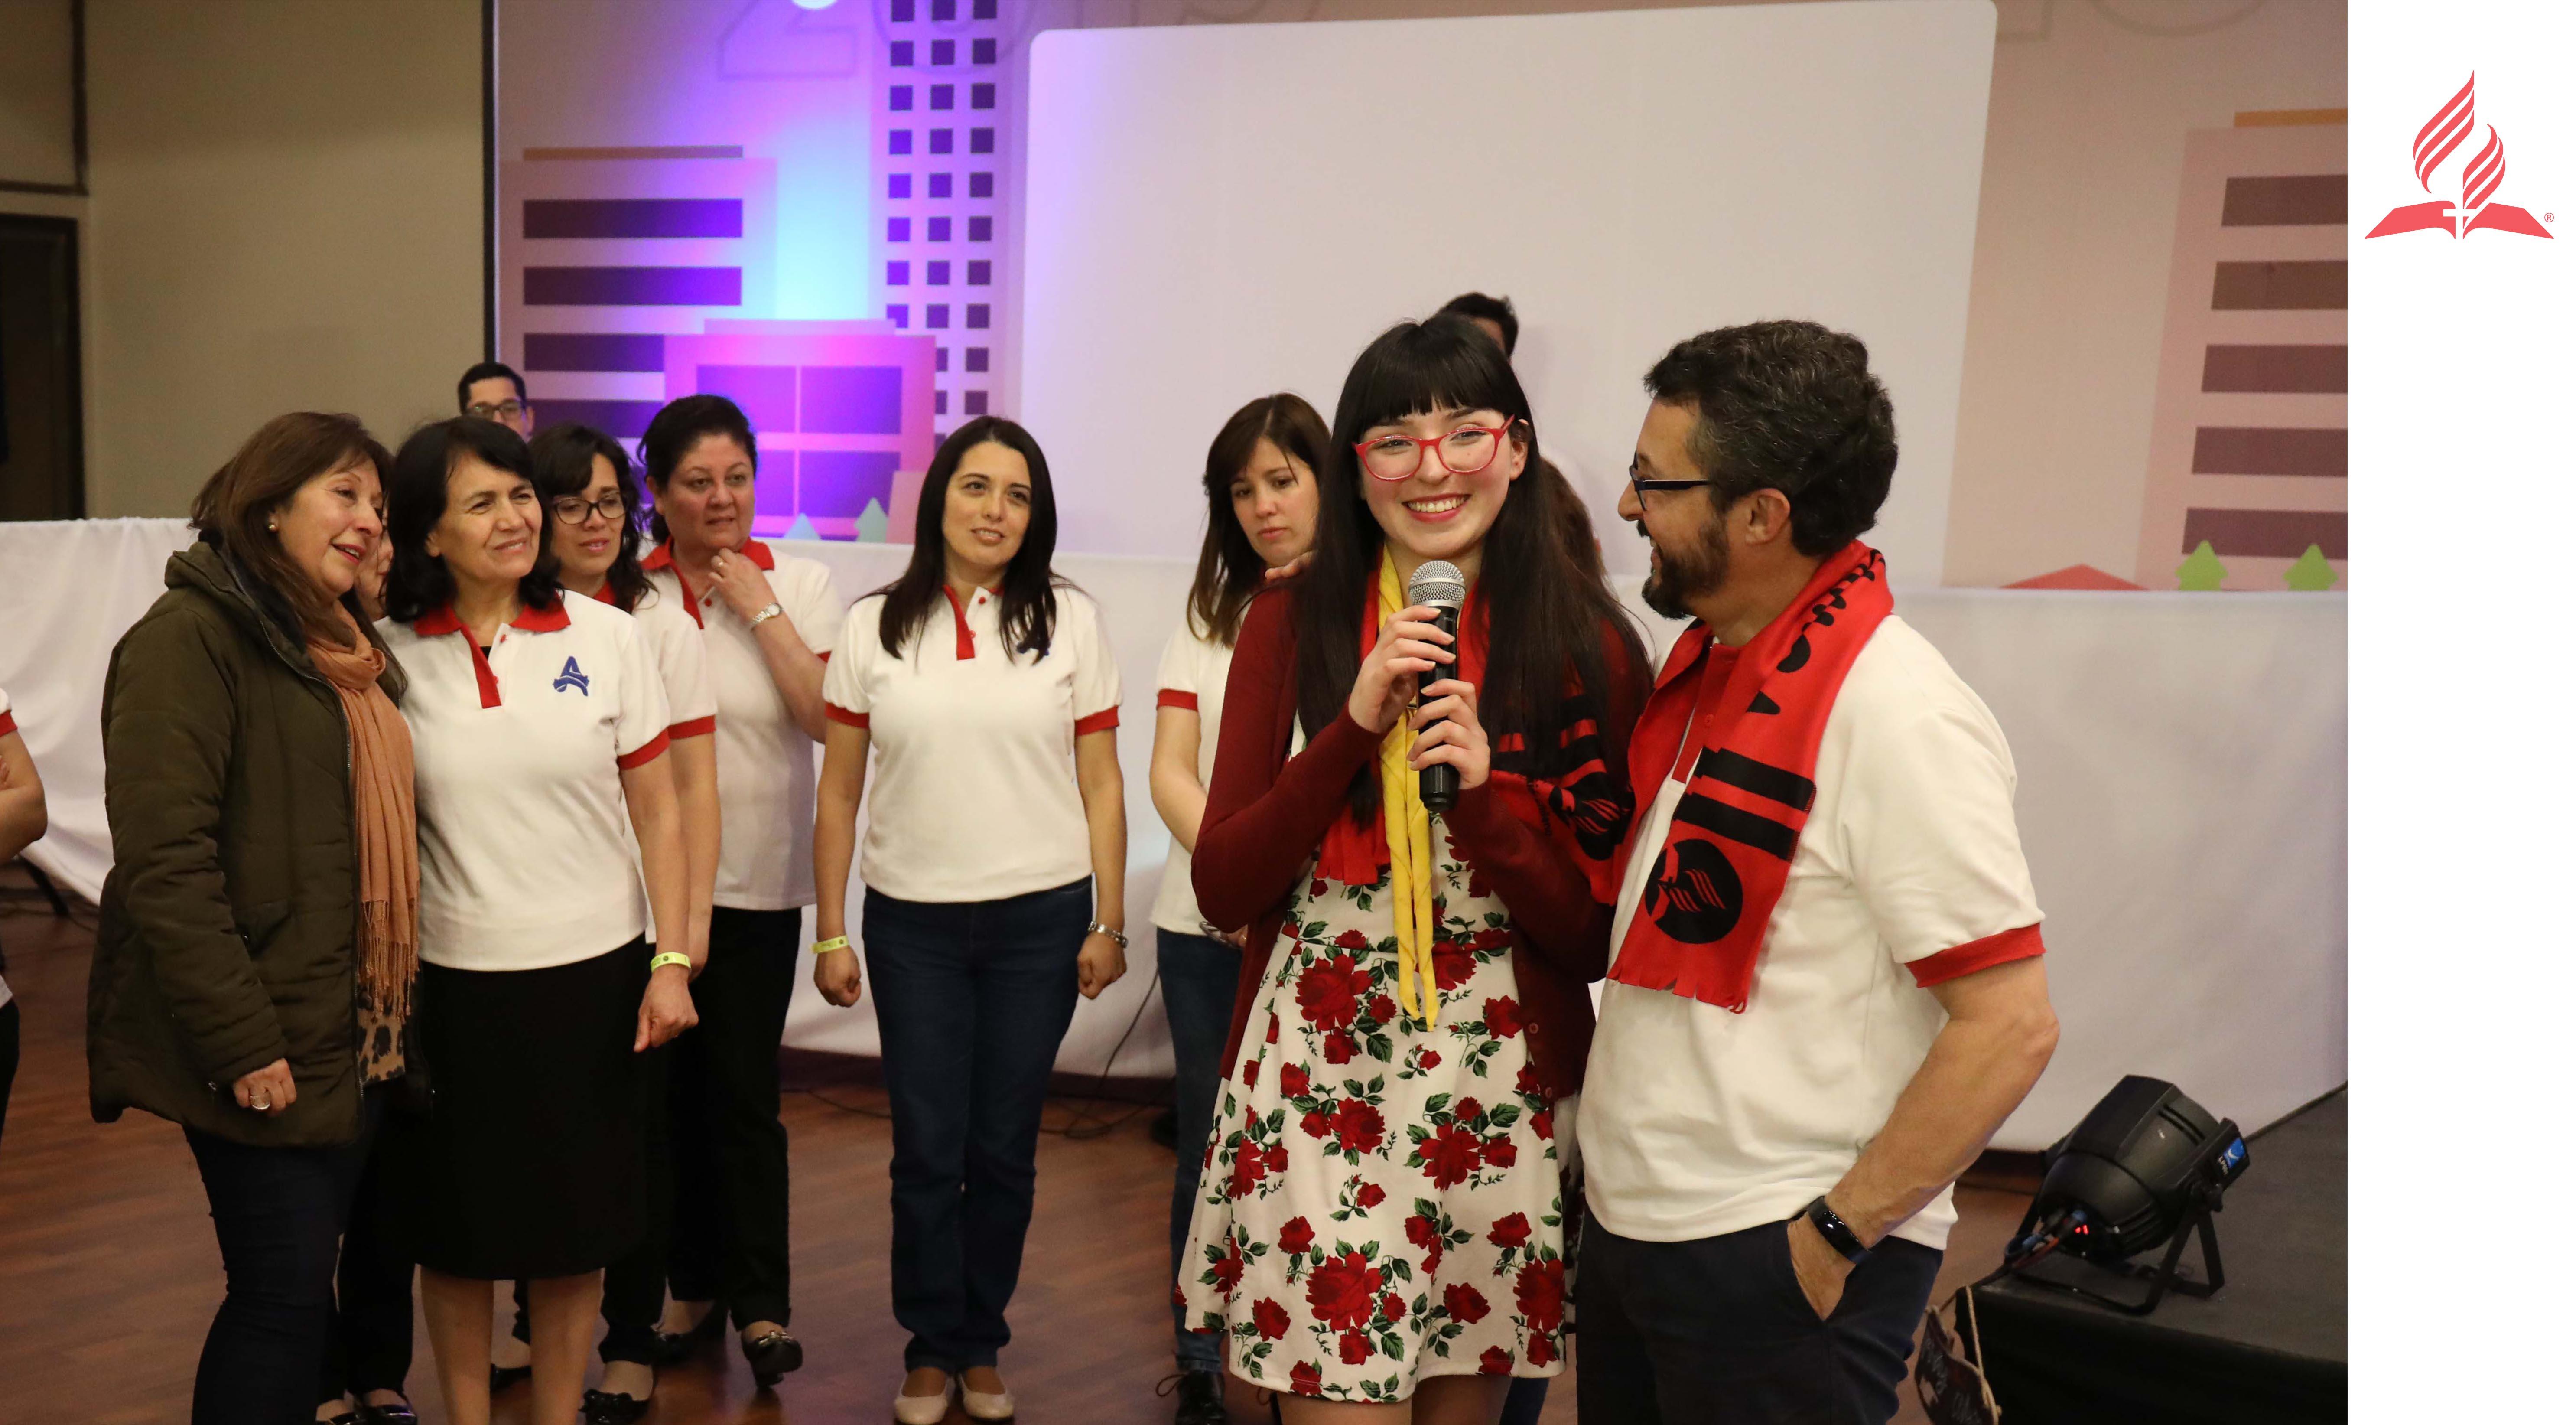 Medios de comunicación chilenos destacan exitosa campaña de maestros adventistas  Noticias